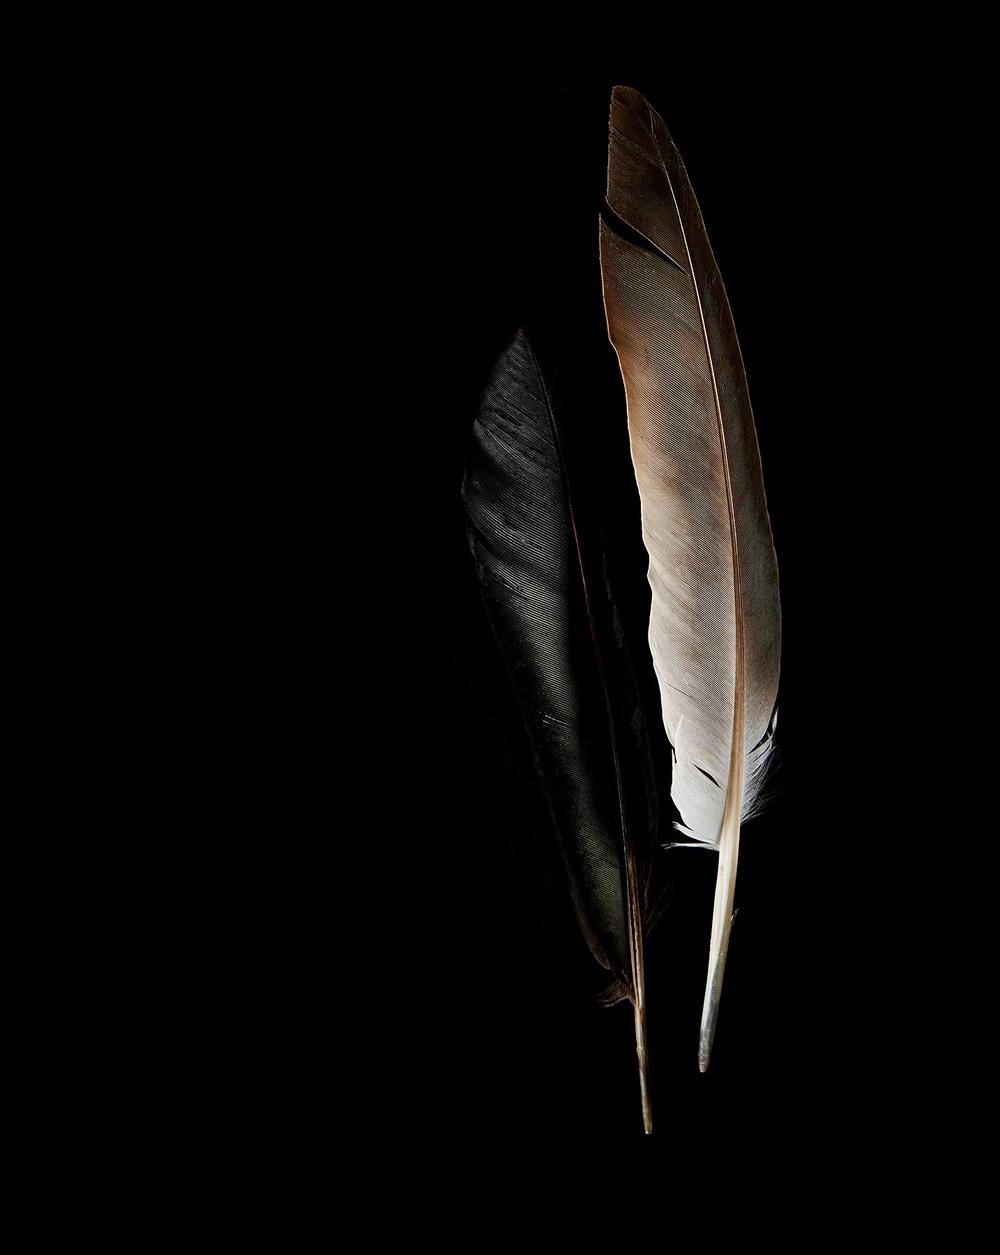 feathers 28.5x20.5.jpg